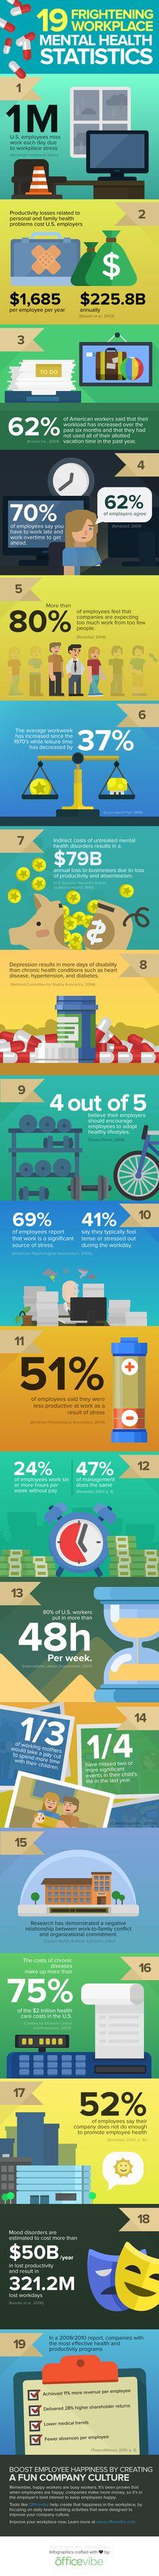 19 Frightening Workplace Mental Health Statistics